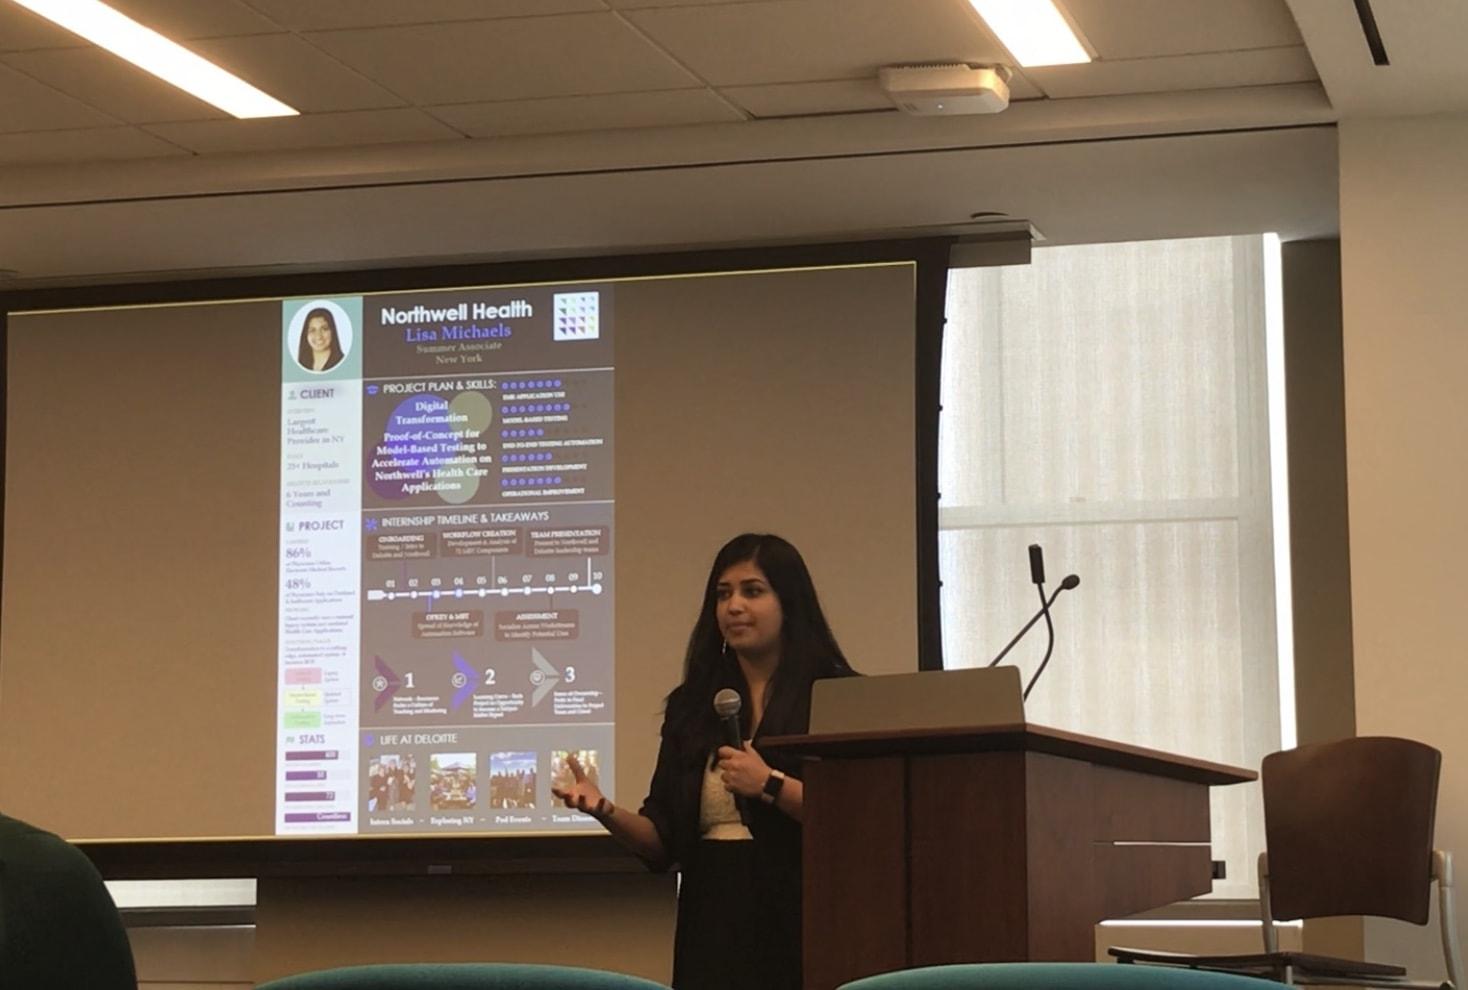 Lisa giving her presentation